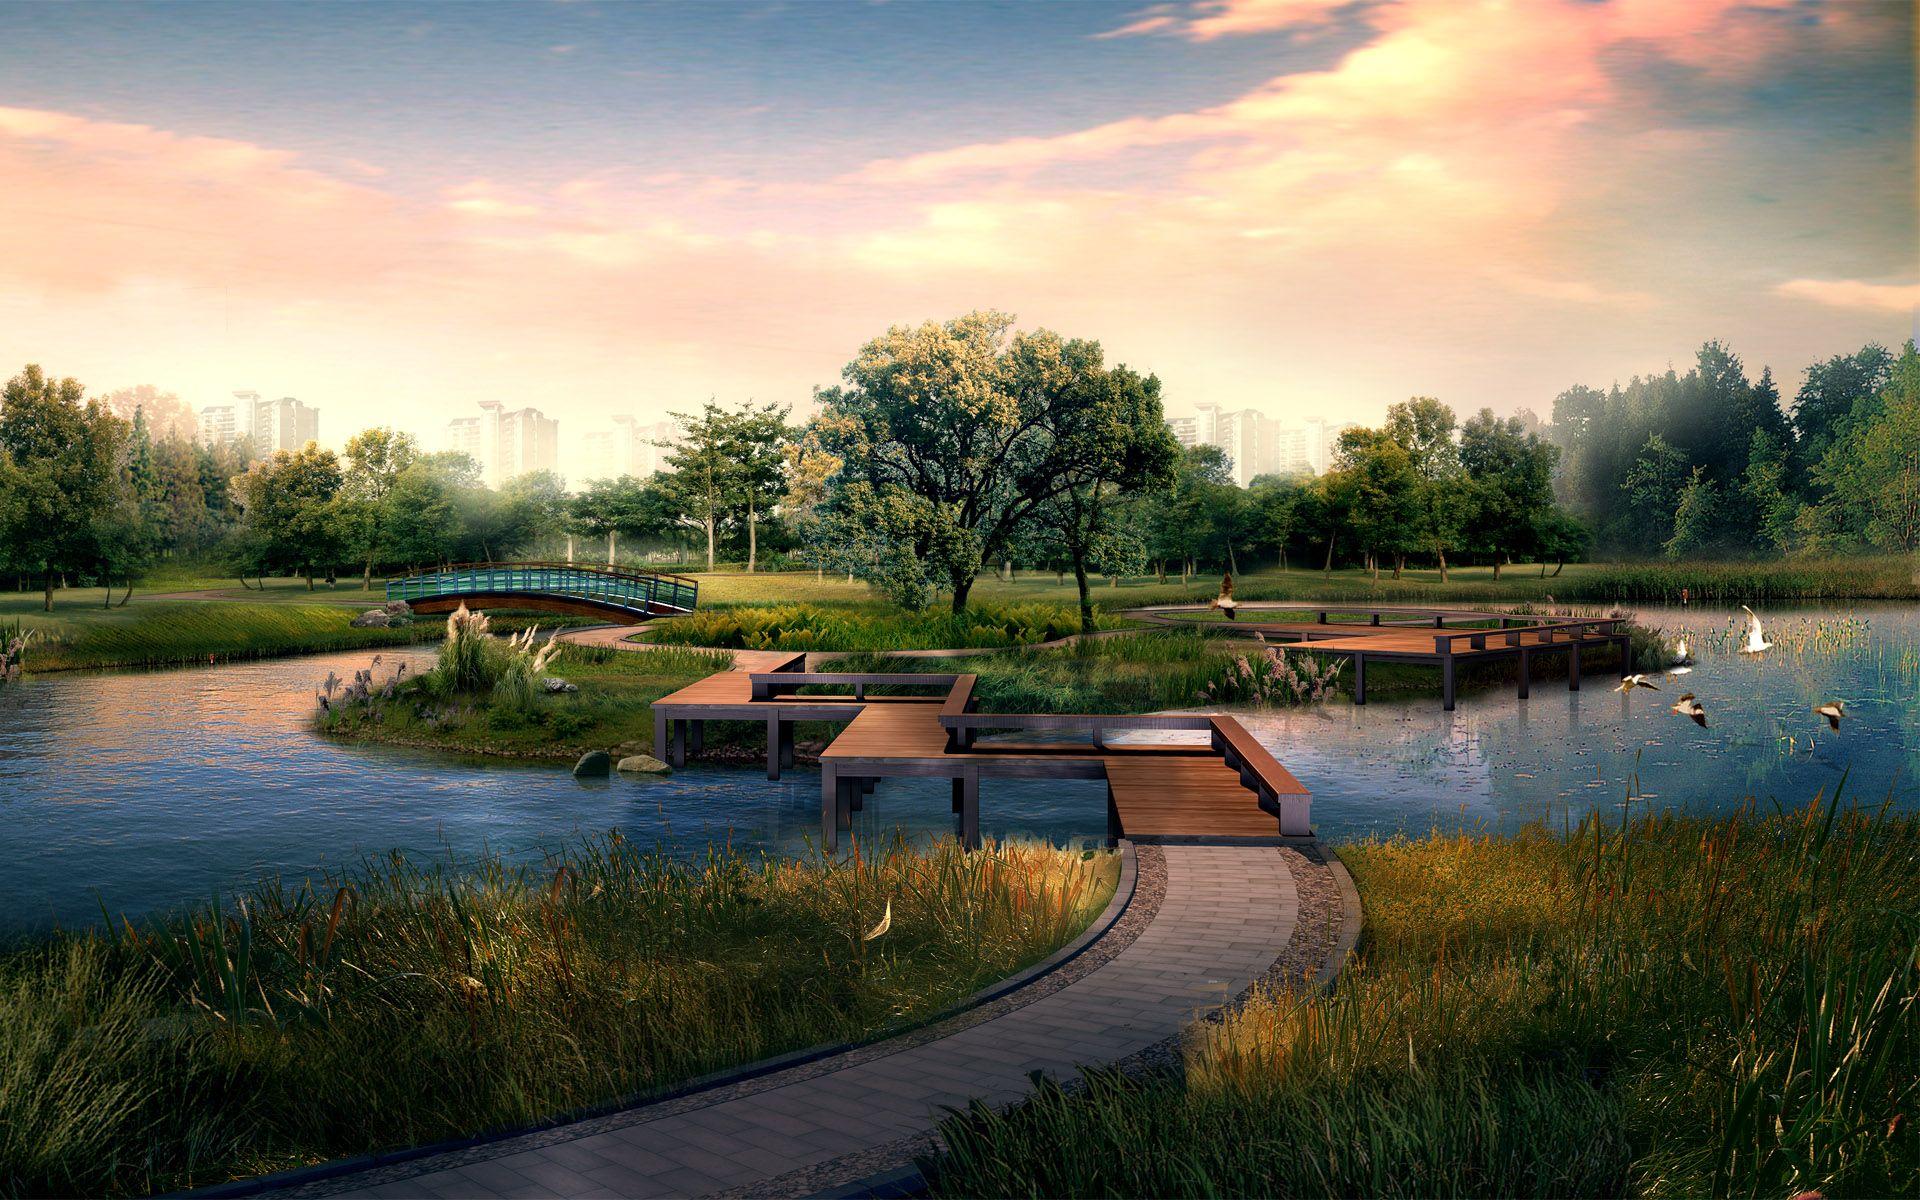 Landscape Wallpaper Japanese Garden Landscape Japanese Garden Garden Architecture